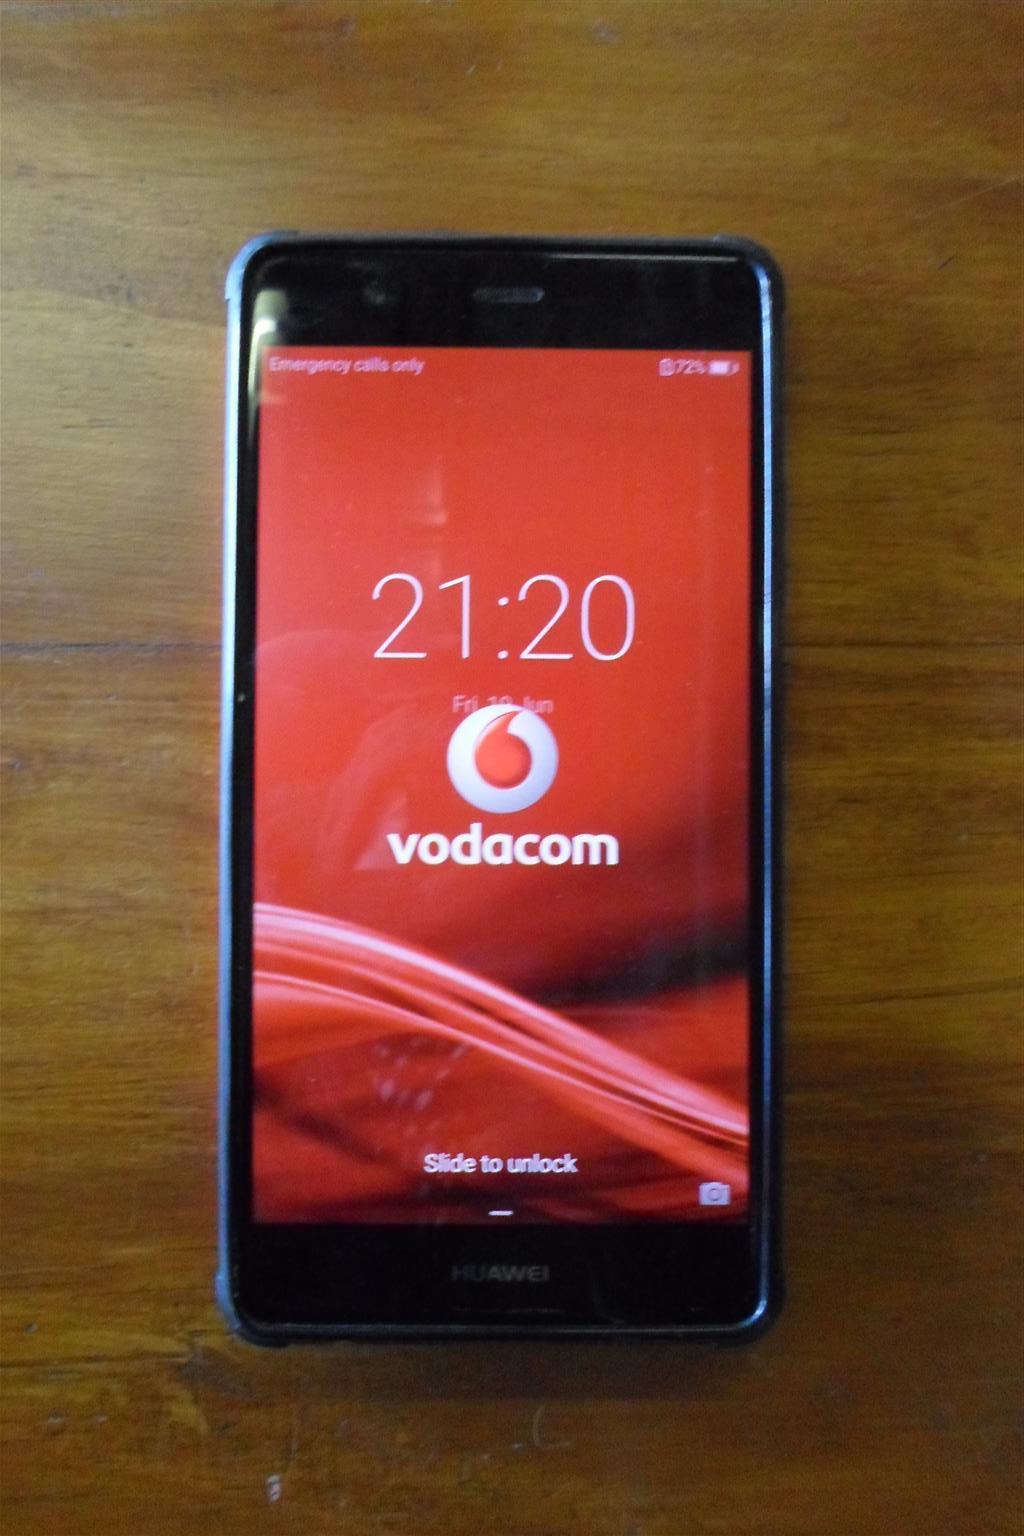 64GB Huawei VIE L09 Cellphone - C033031679-1